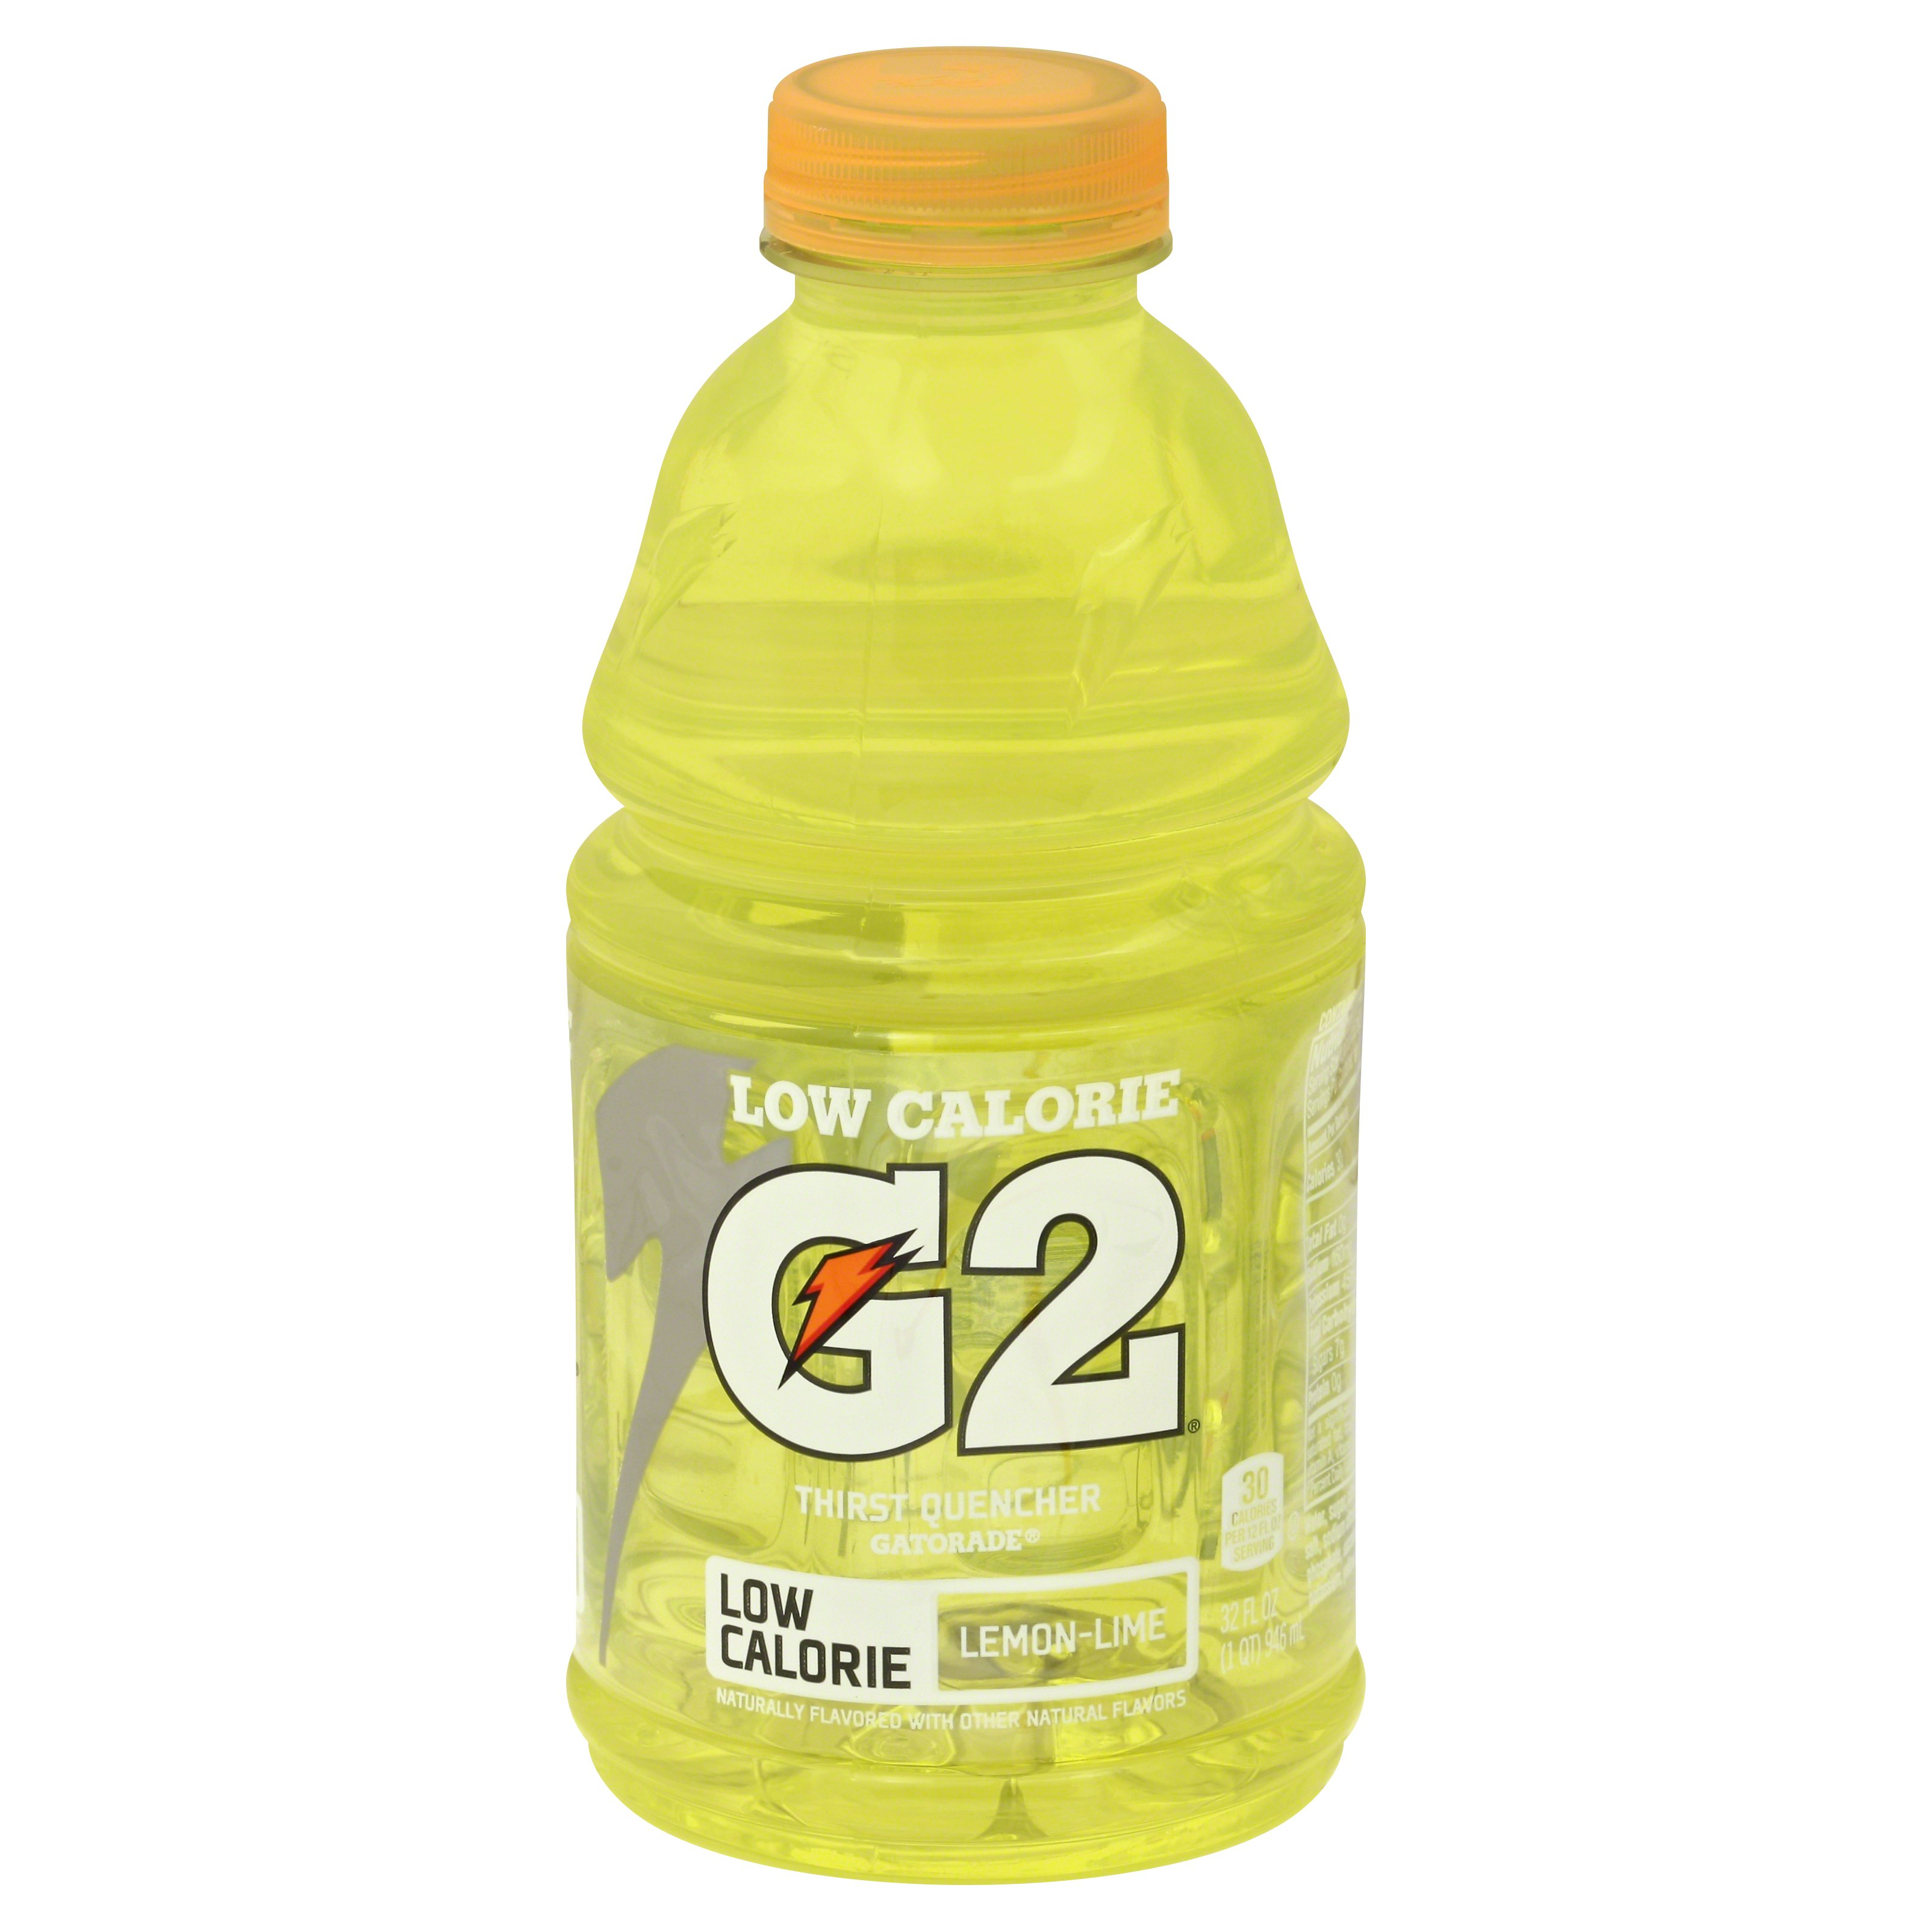 Gatorade Lemon-Lime Low Calorie Sports Drink 32OZ 12-Pack